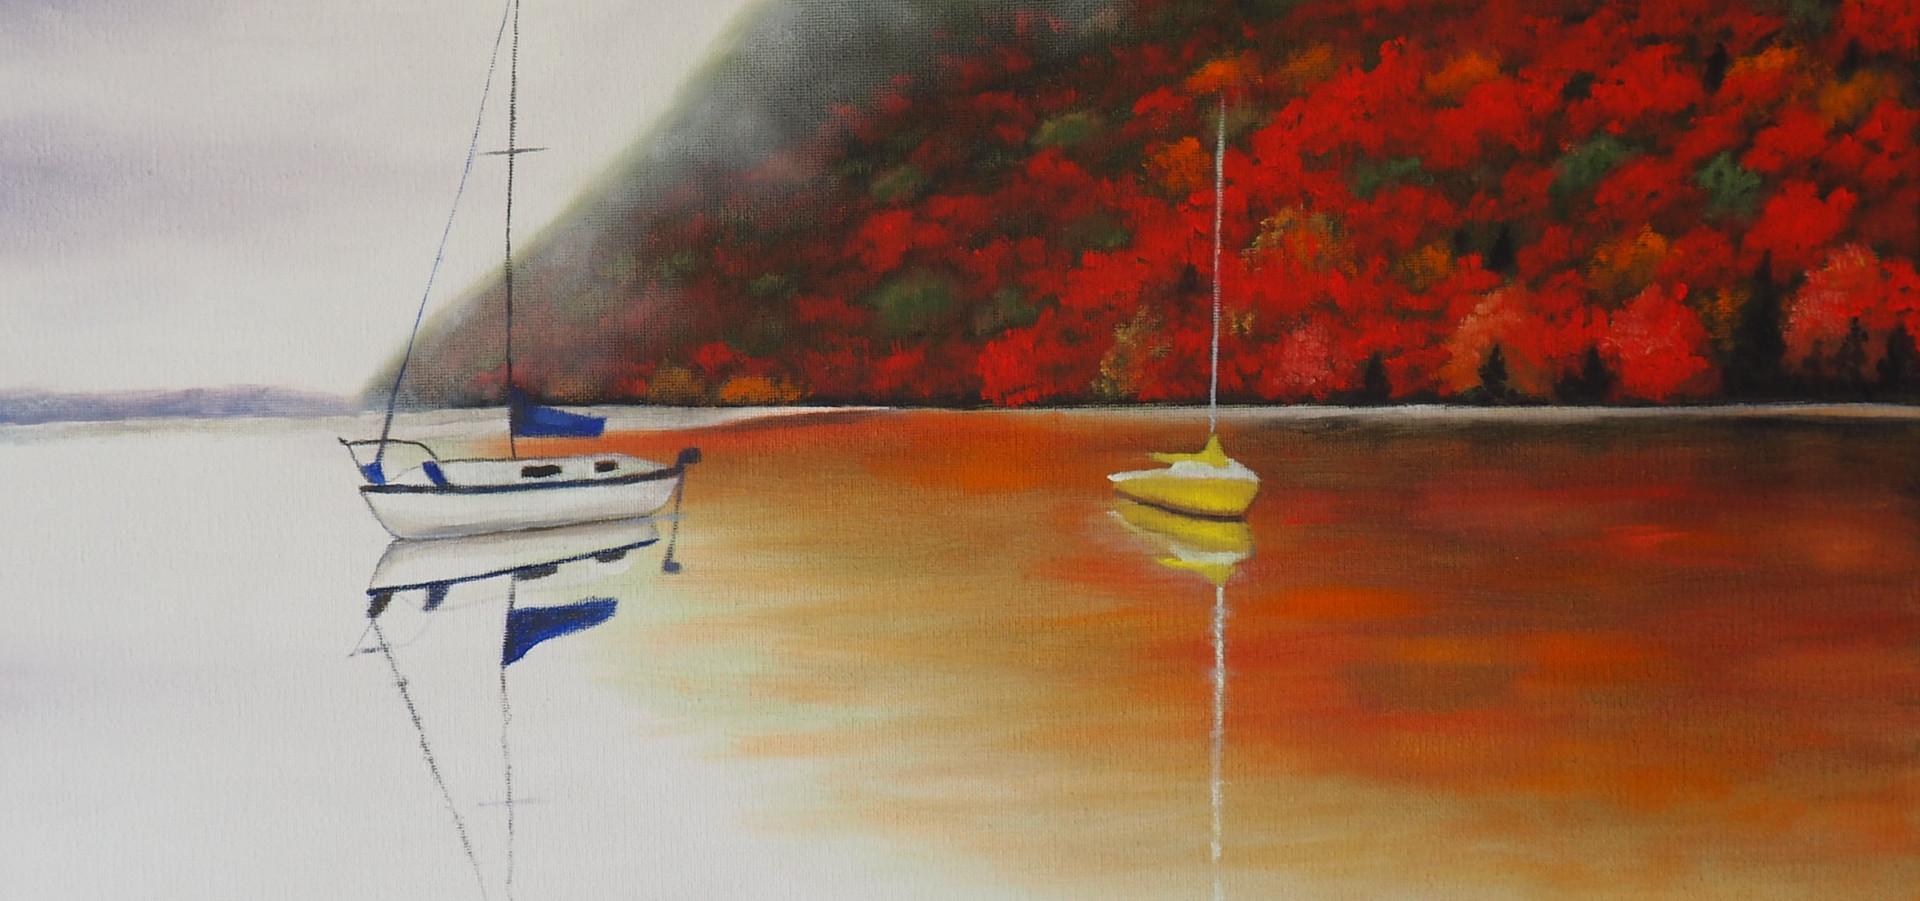 Sailboats in the Fall.JPG